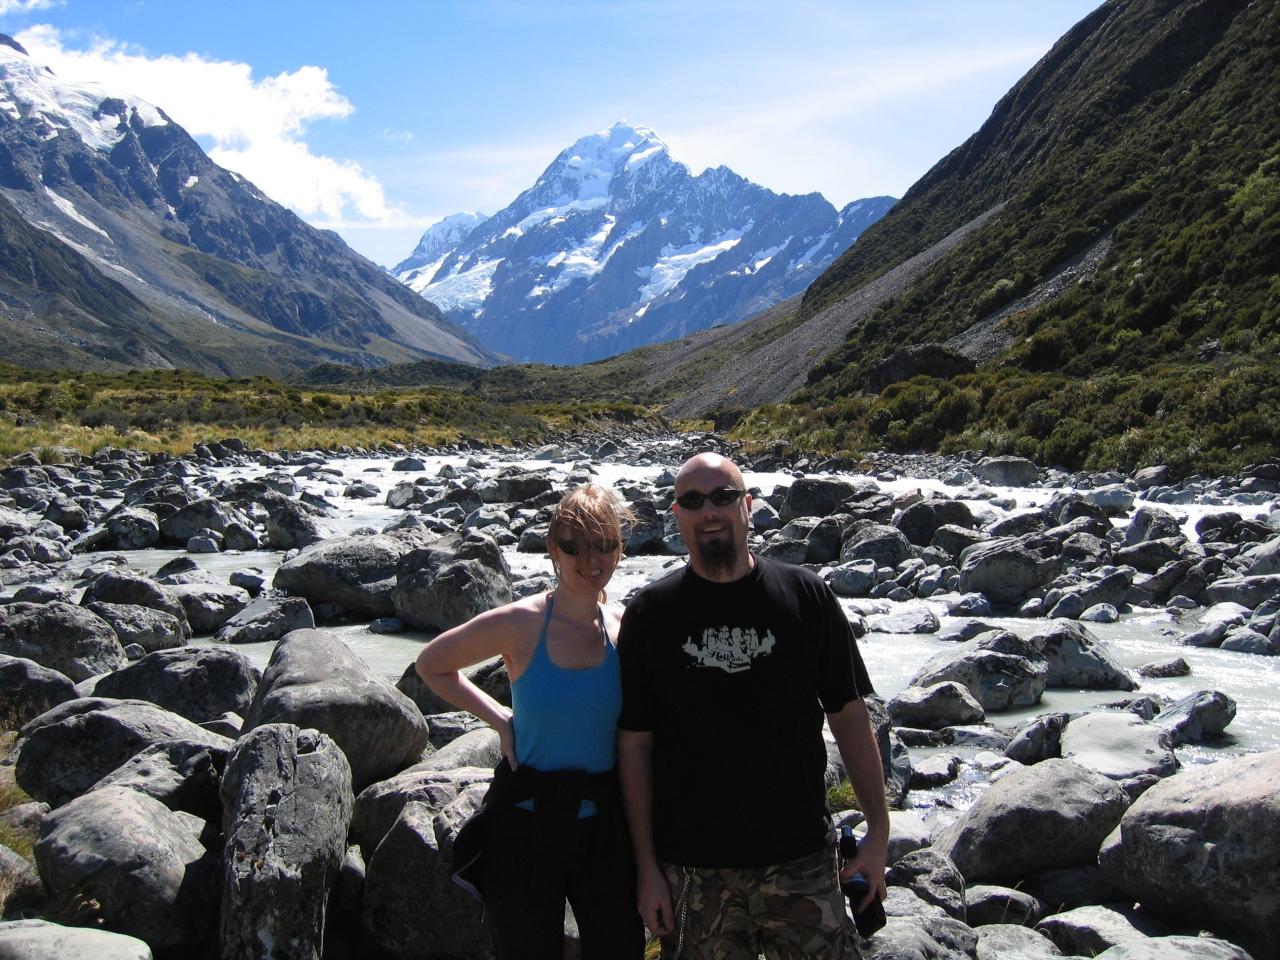 South Island, New Zealand, e aroha ana ahau ki akoe!